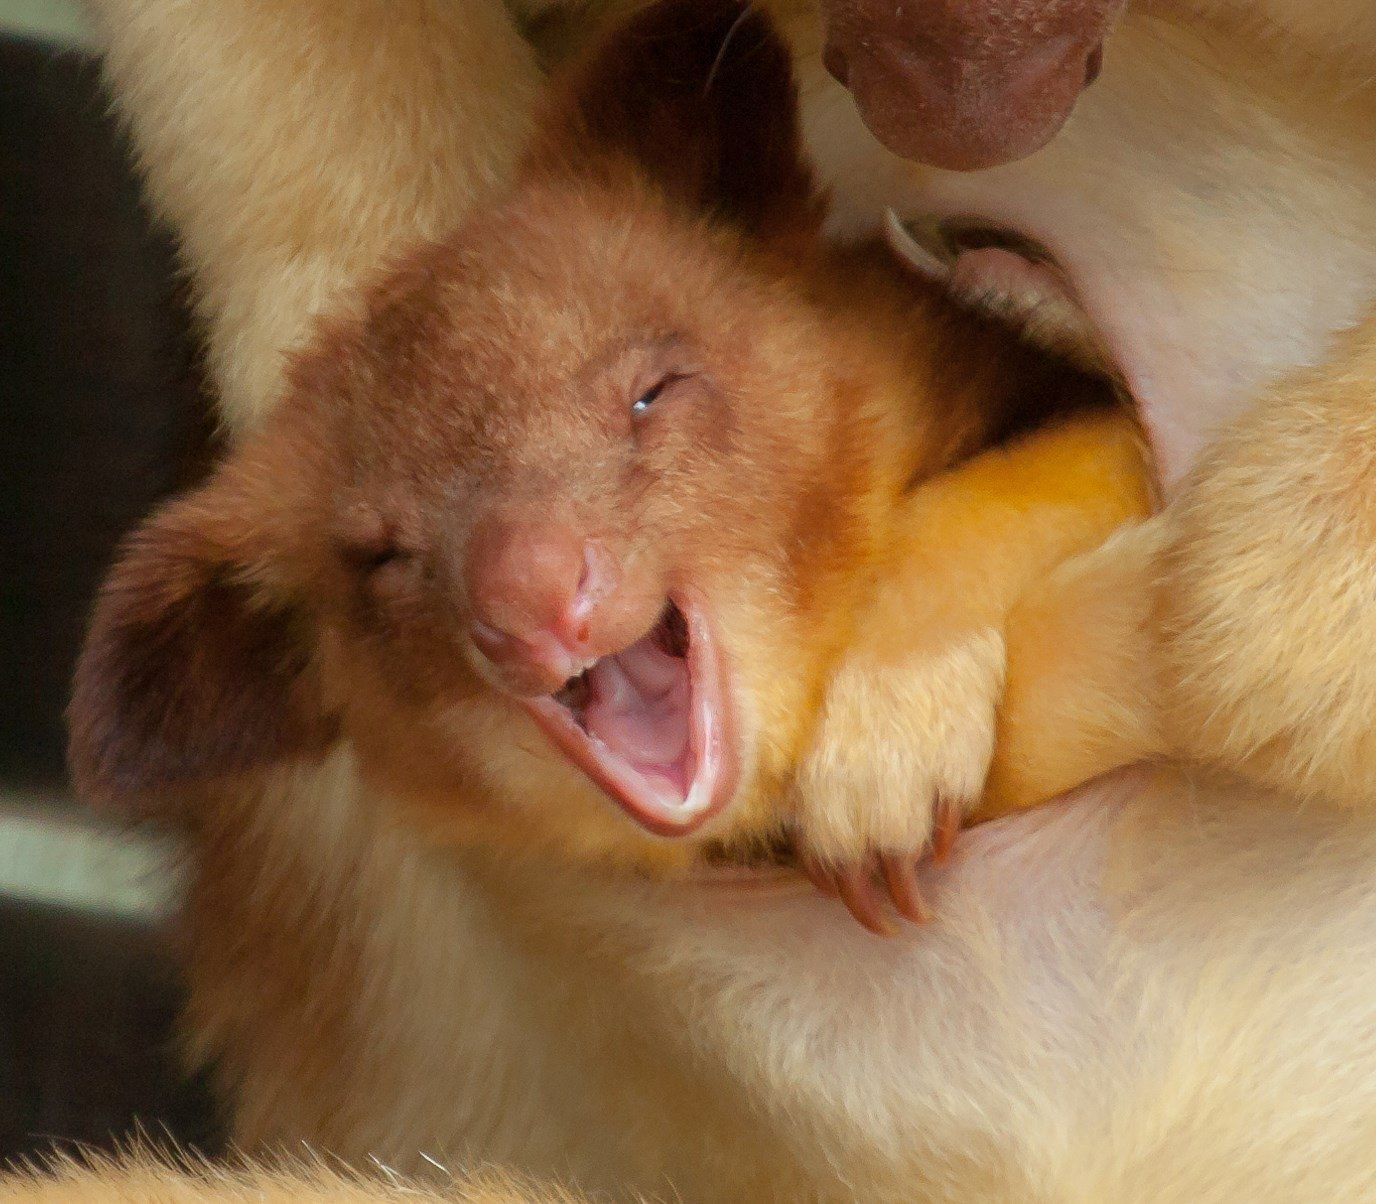 this adorable newborn joey is mani a rare goodfellows tree kangaroo imgur